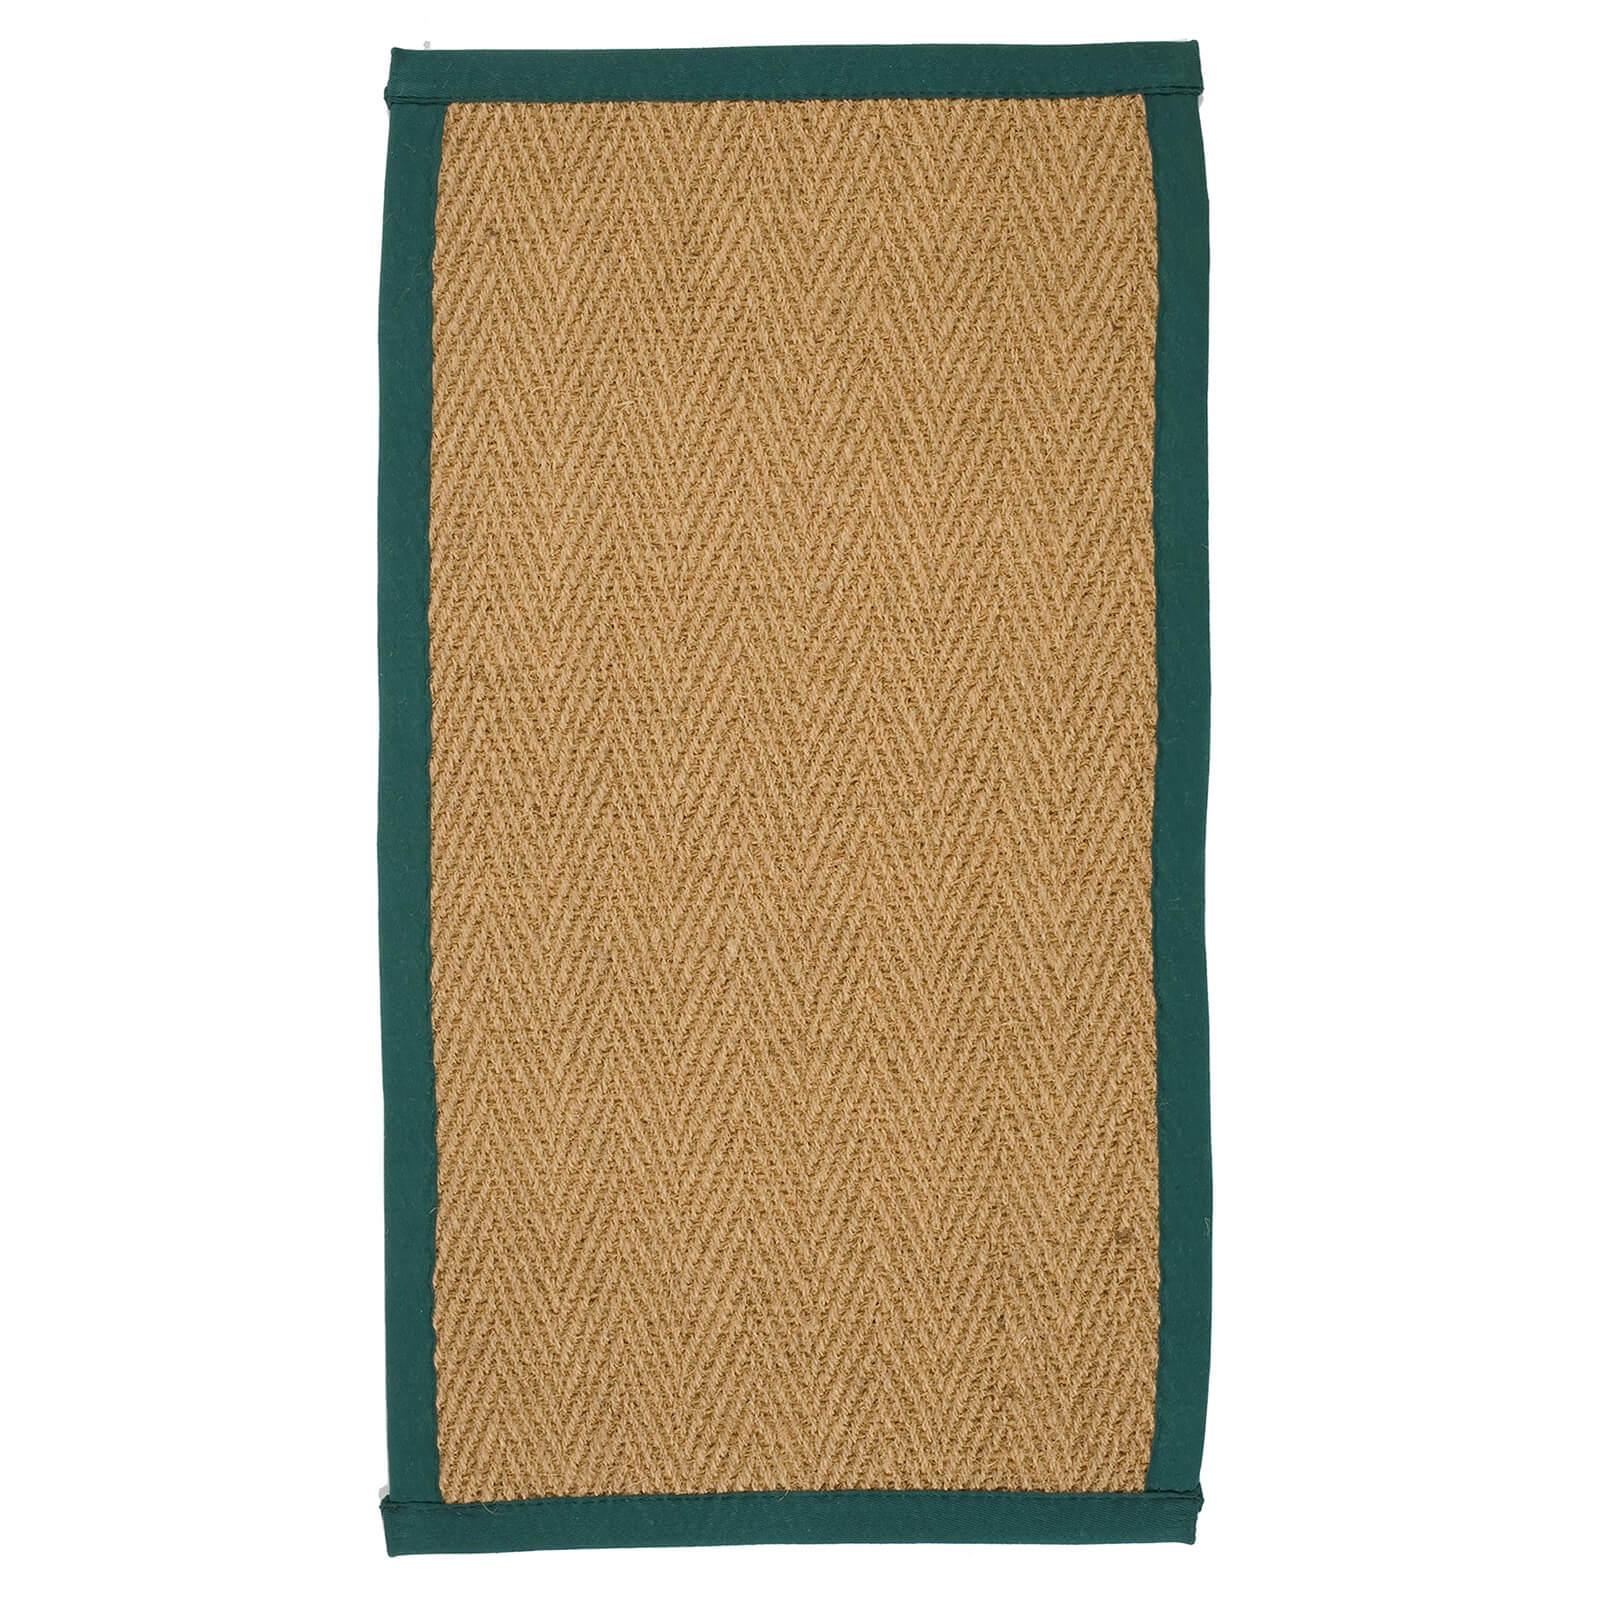 Coir Herringbone Rug - With Green Border